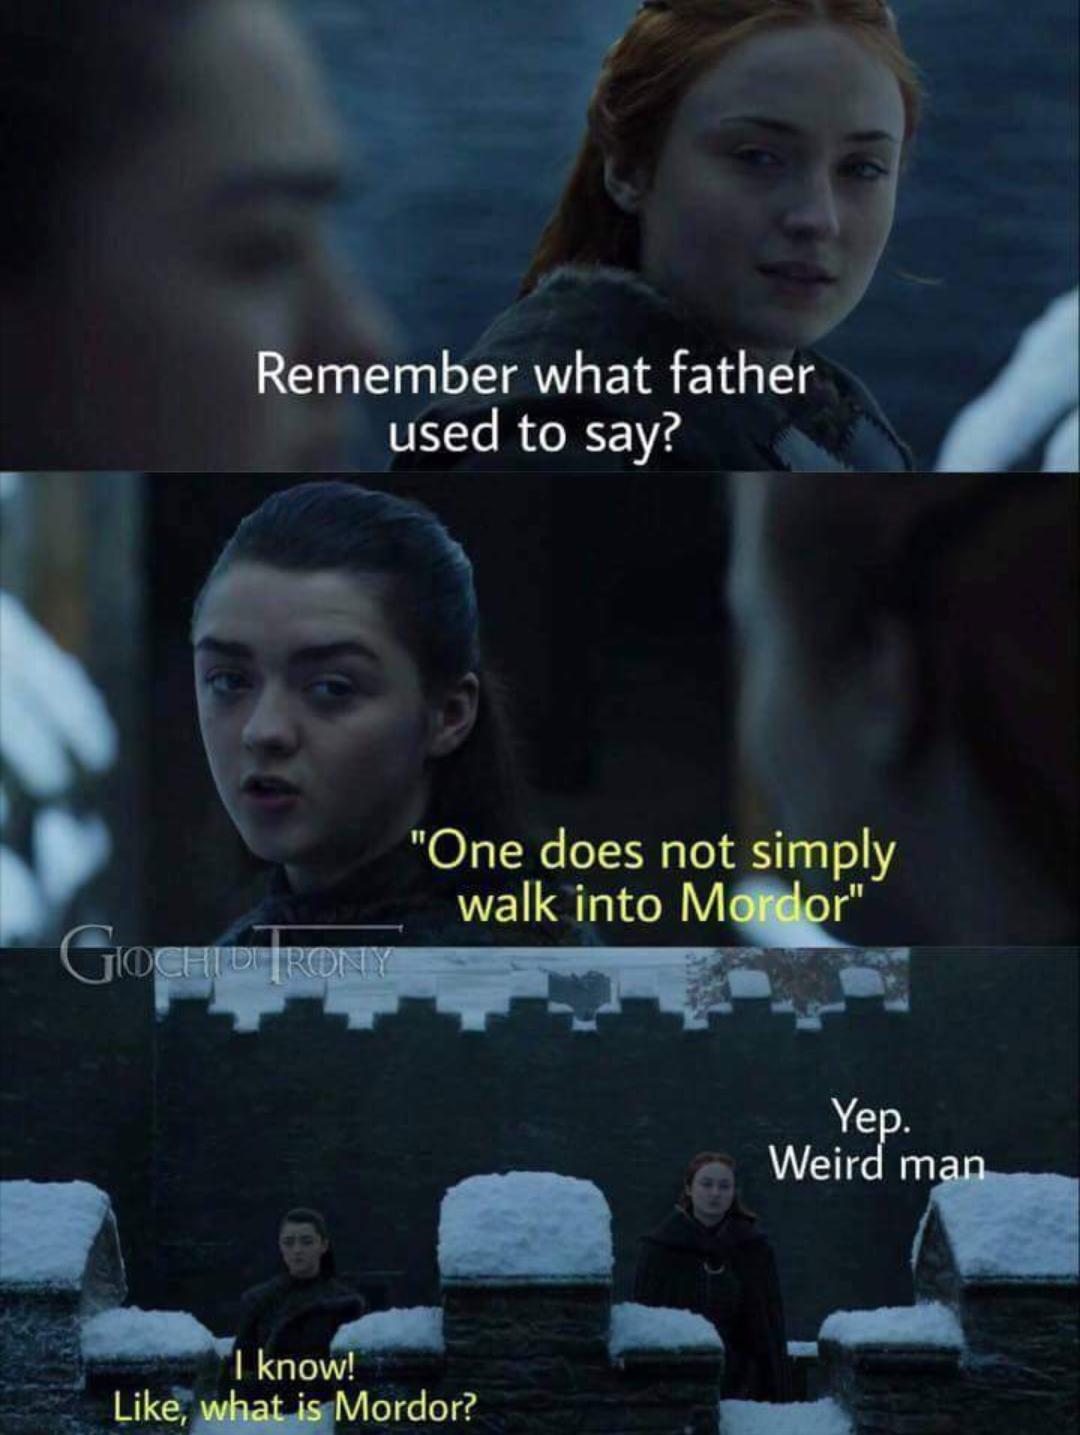 Sansa Stark Memes : sansa, stark, memes, Thrones, Season, Funny, Humour, Meme,, LOTR,, Crossover,, Sansa, Stark,, Maisie, Williams,, Funny,, Games